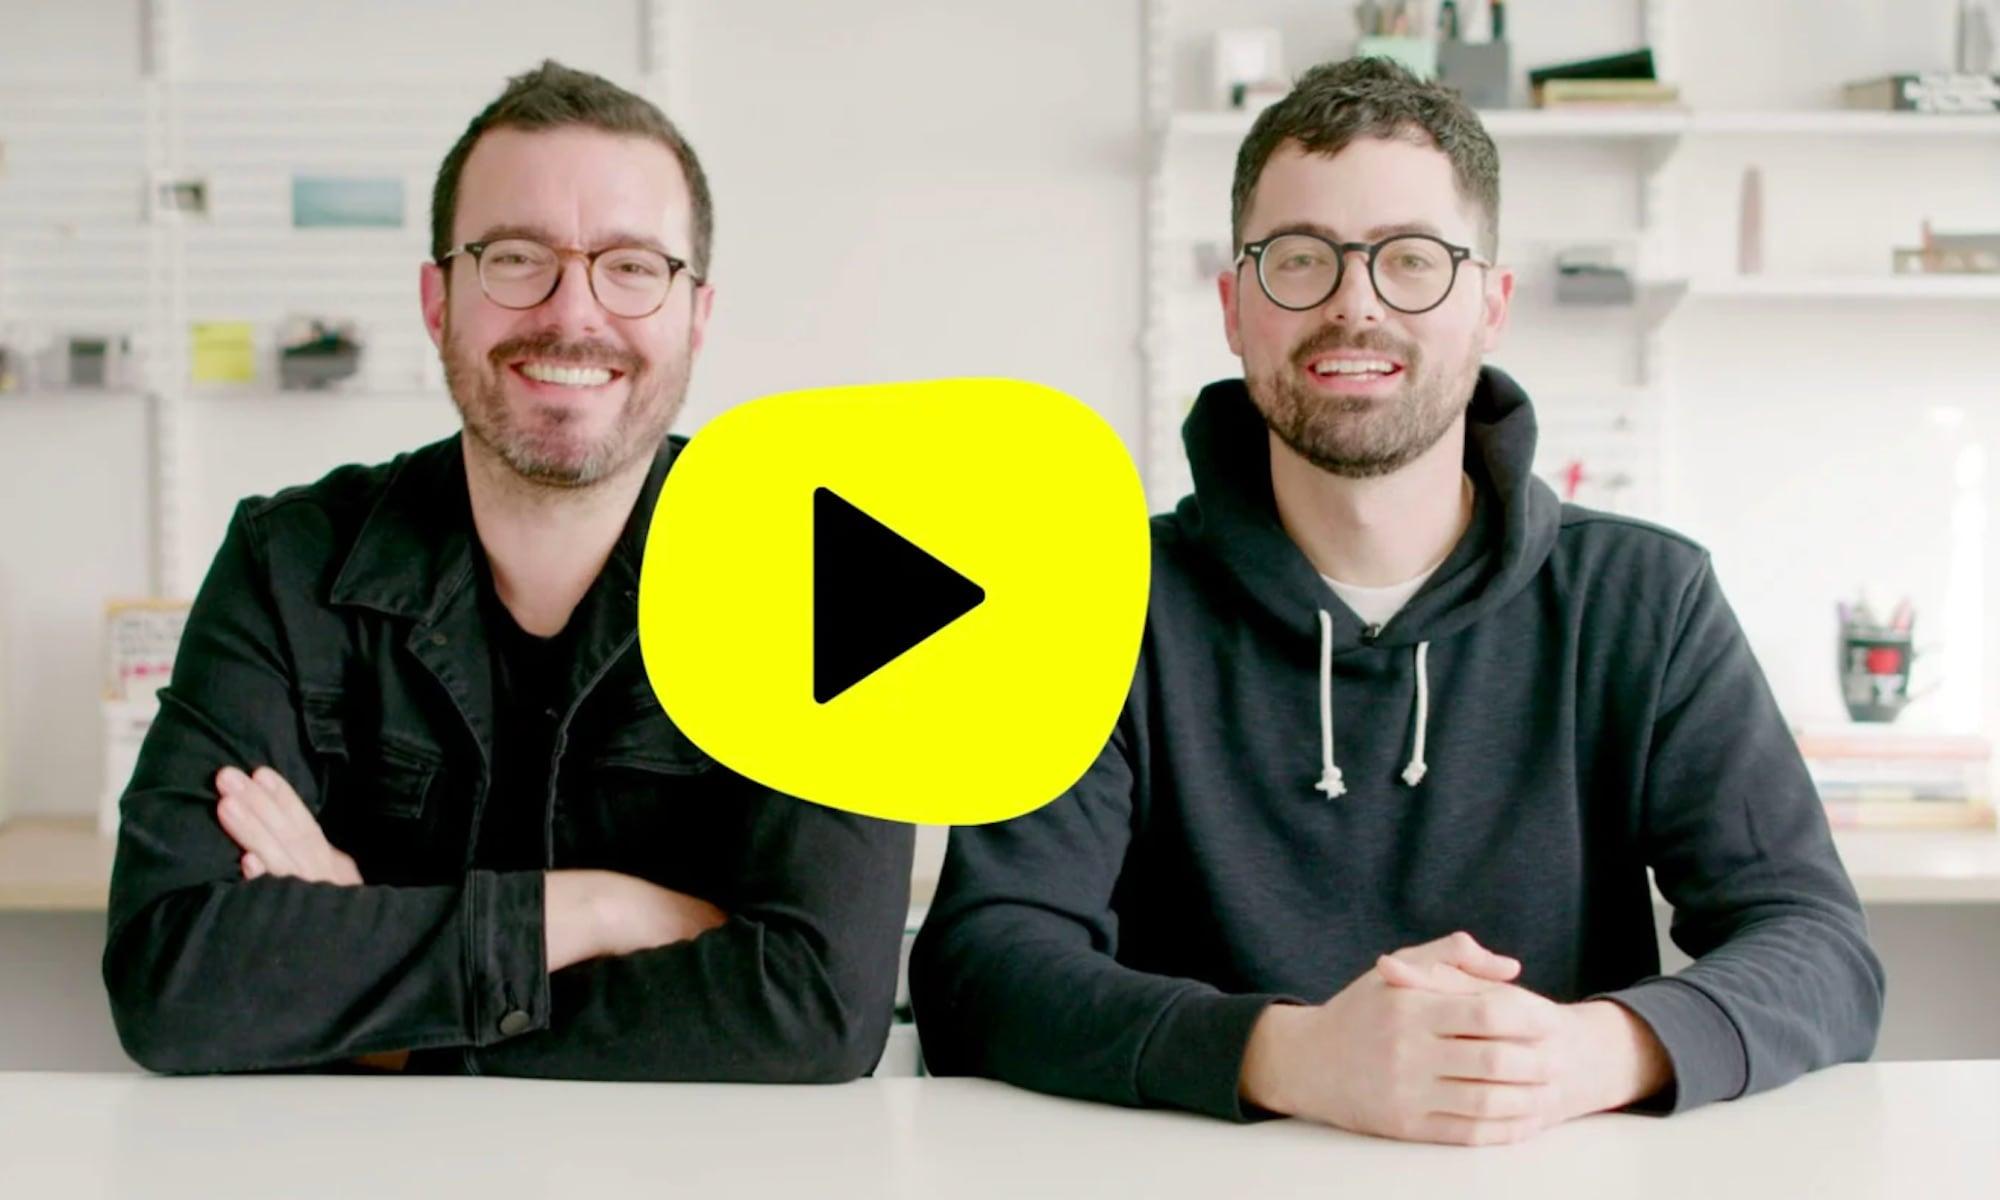 Kickstarter Masterclass from Launch Studio